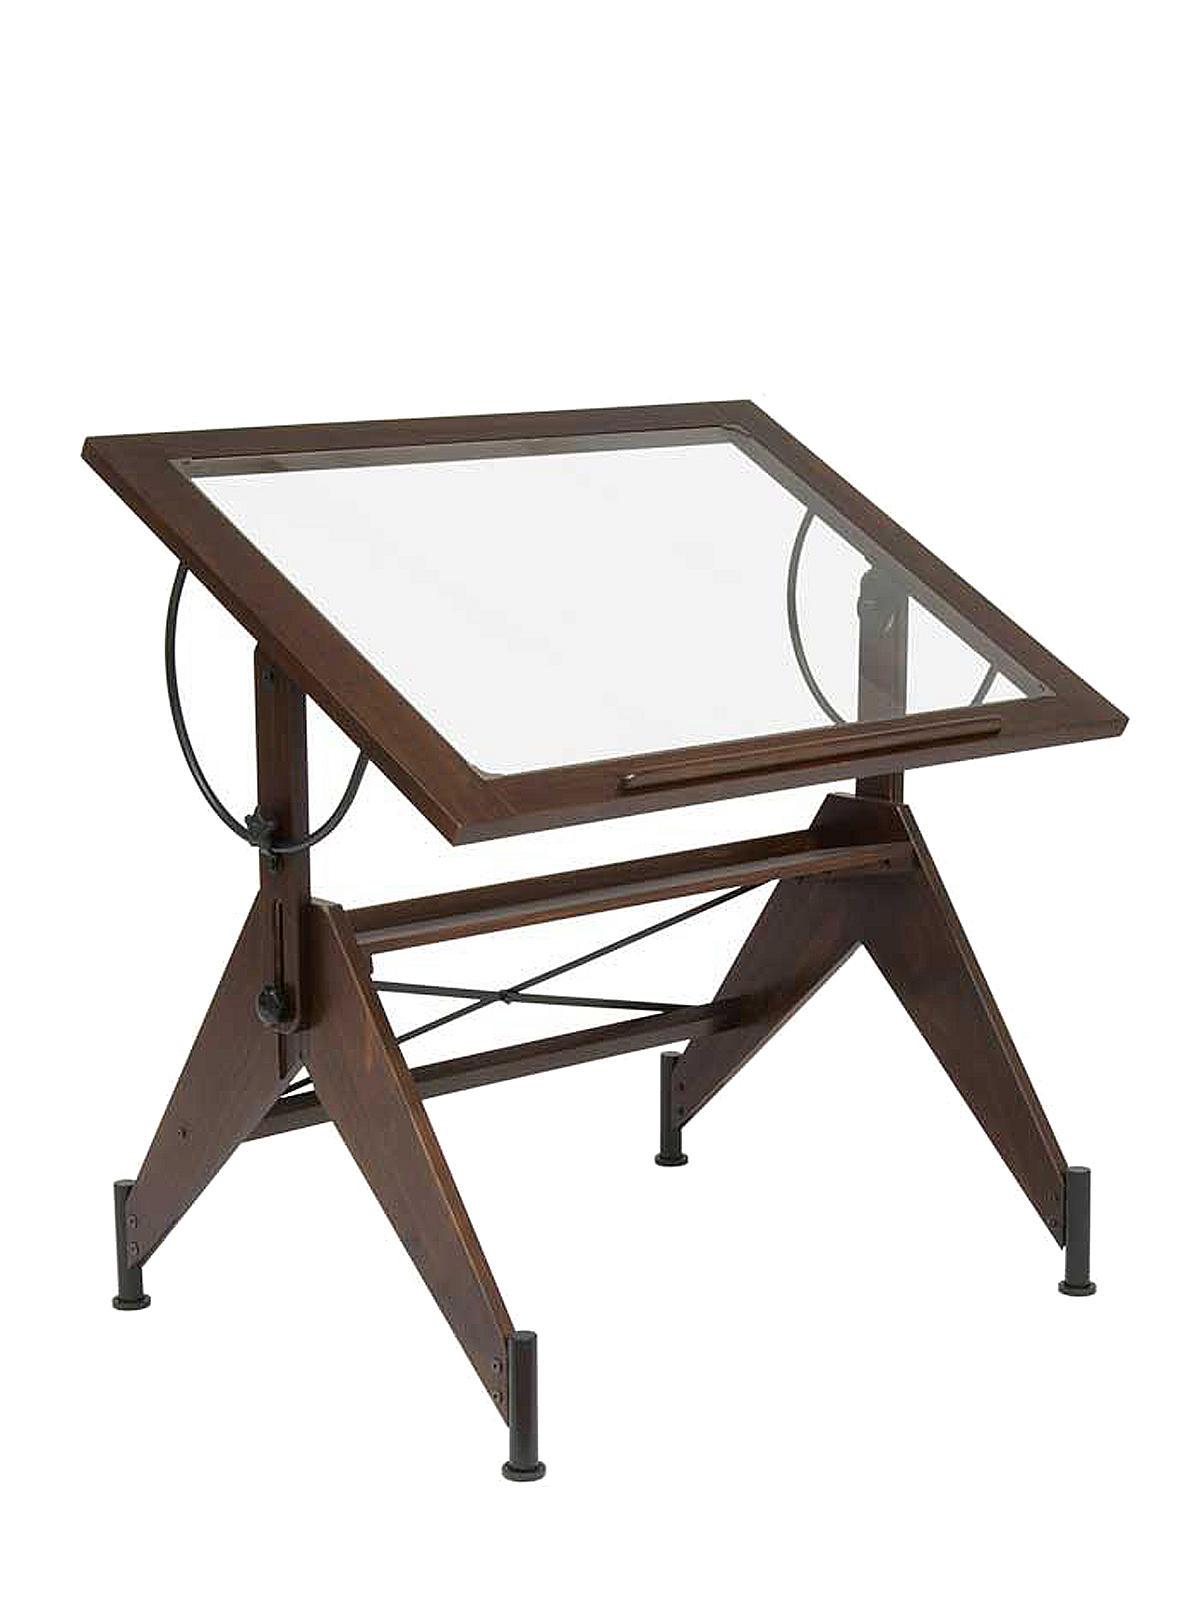 Drafting Table Glass Studio Designs Aries Top